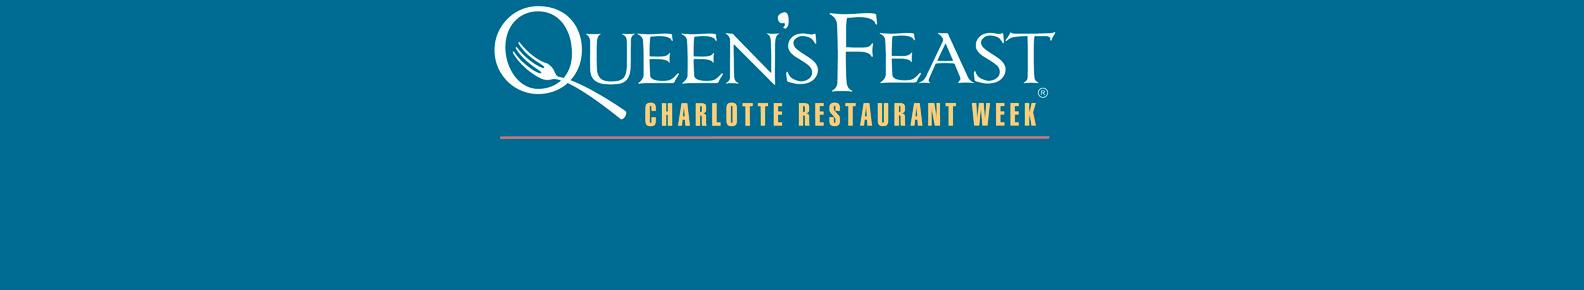 Charlotte restaurant week january 16 25 2015 opentable for Table 52 restaurant week 2015